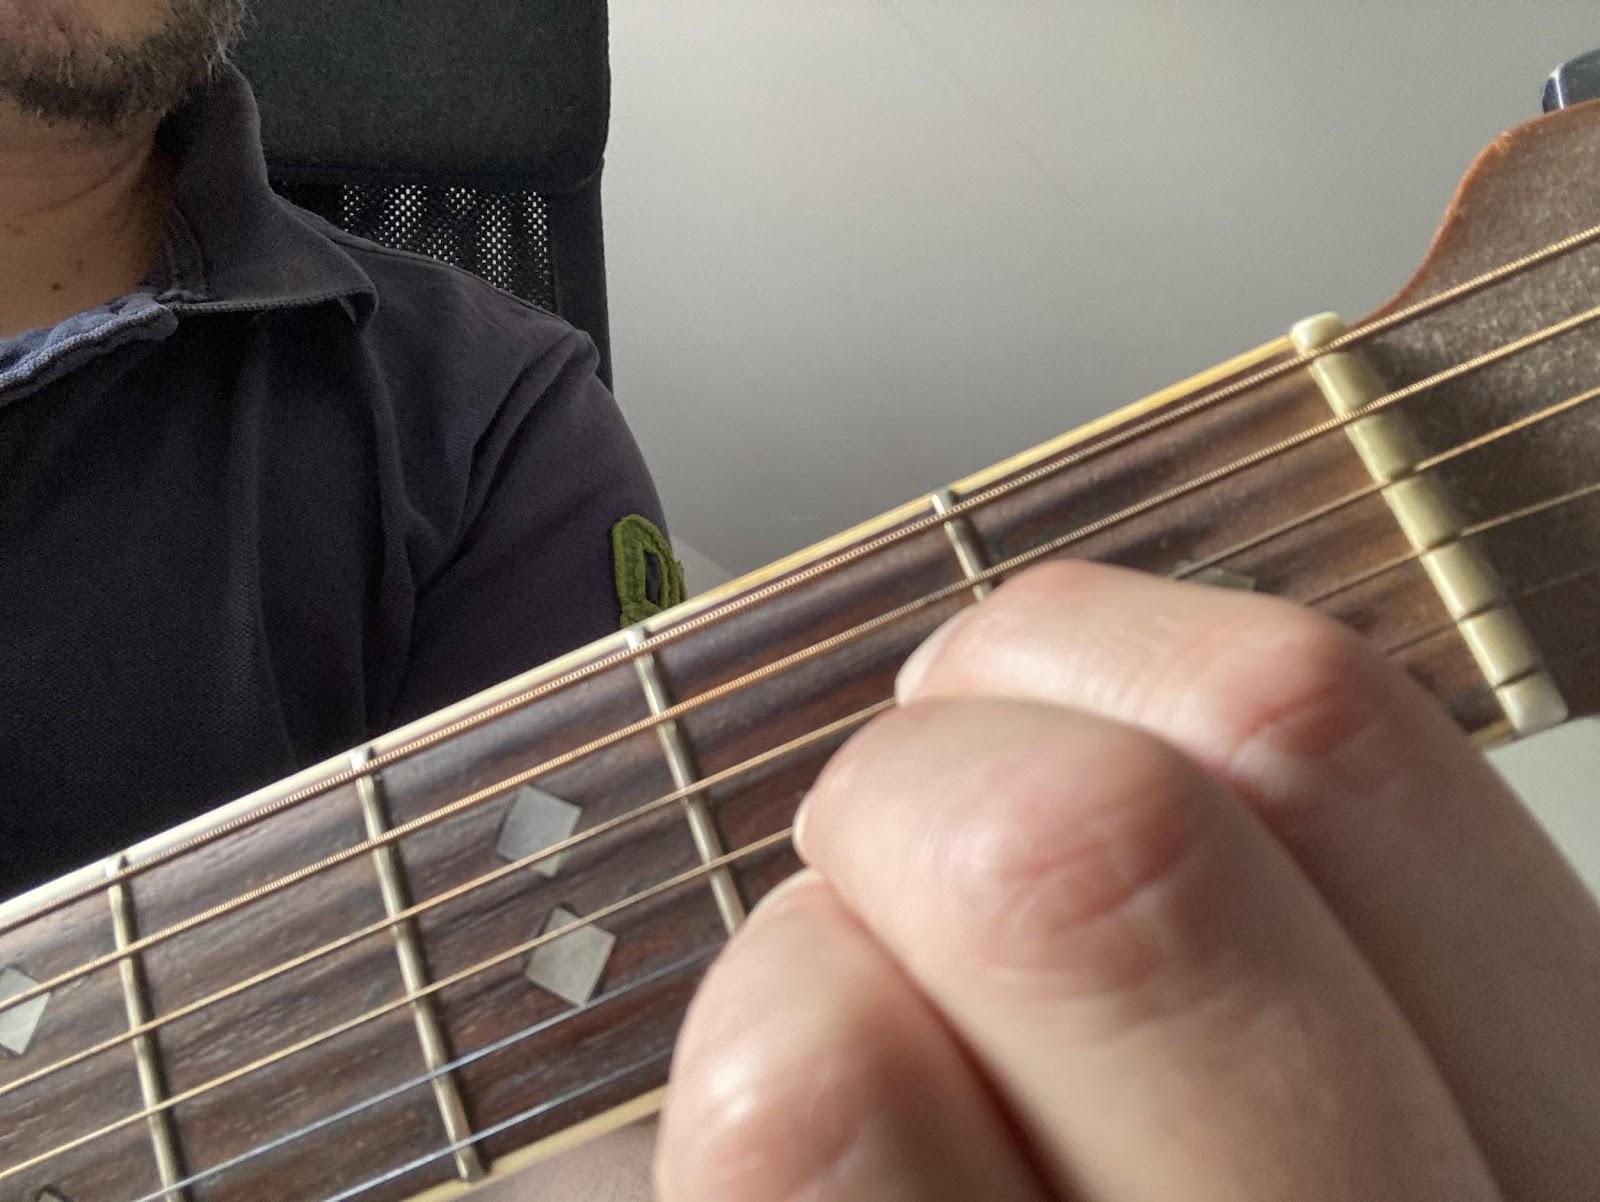 A major chord on guitar